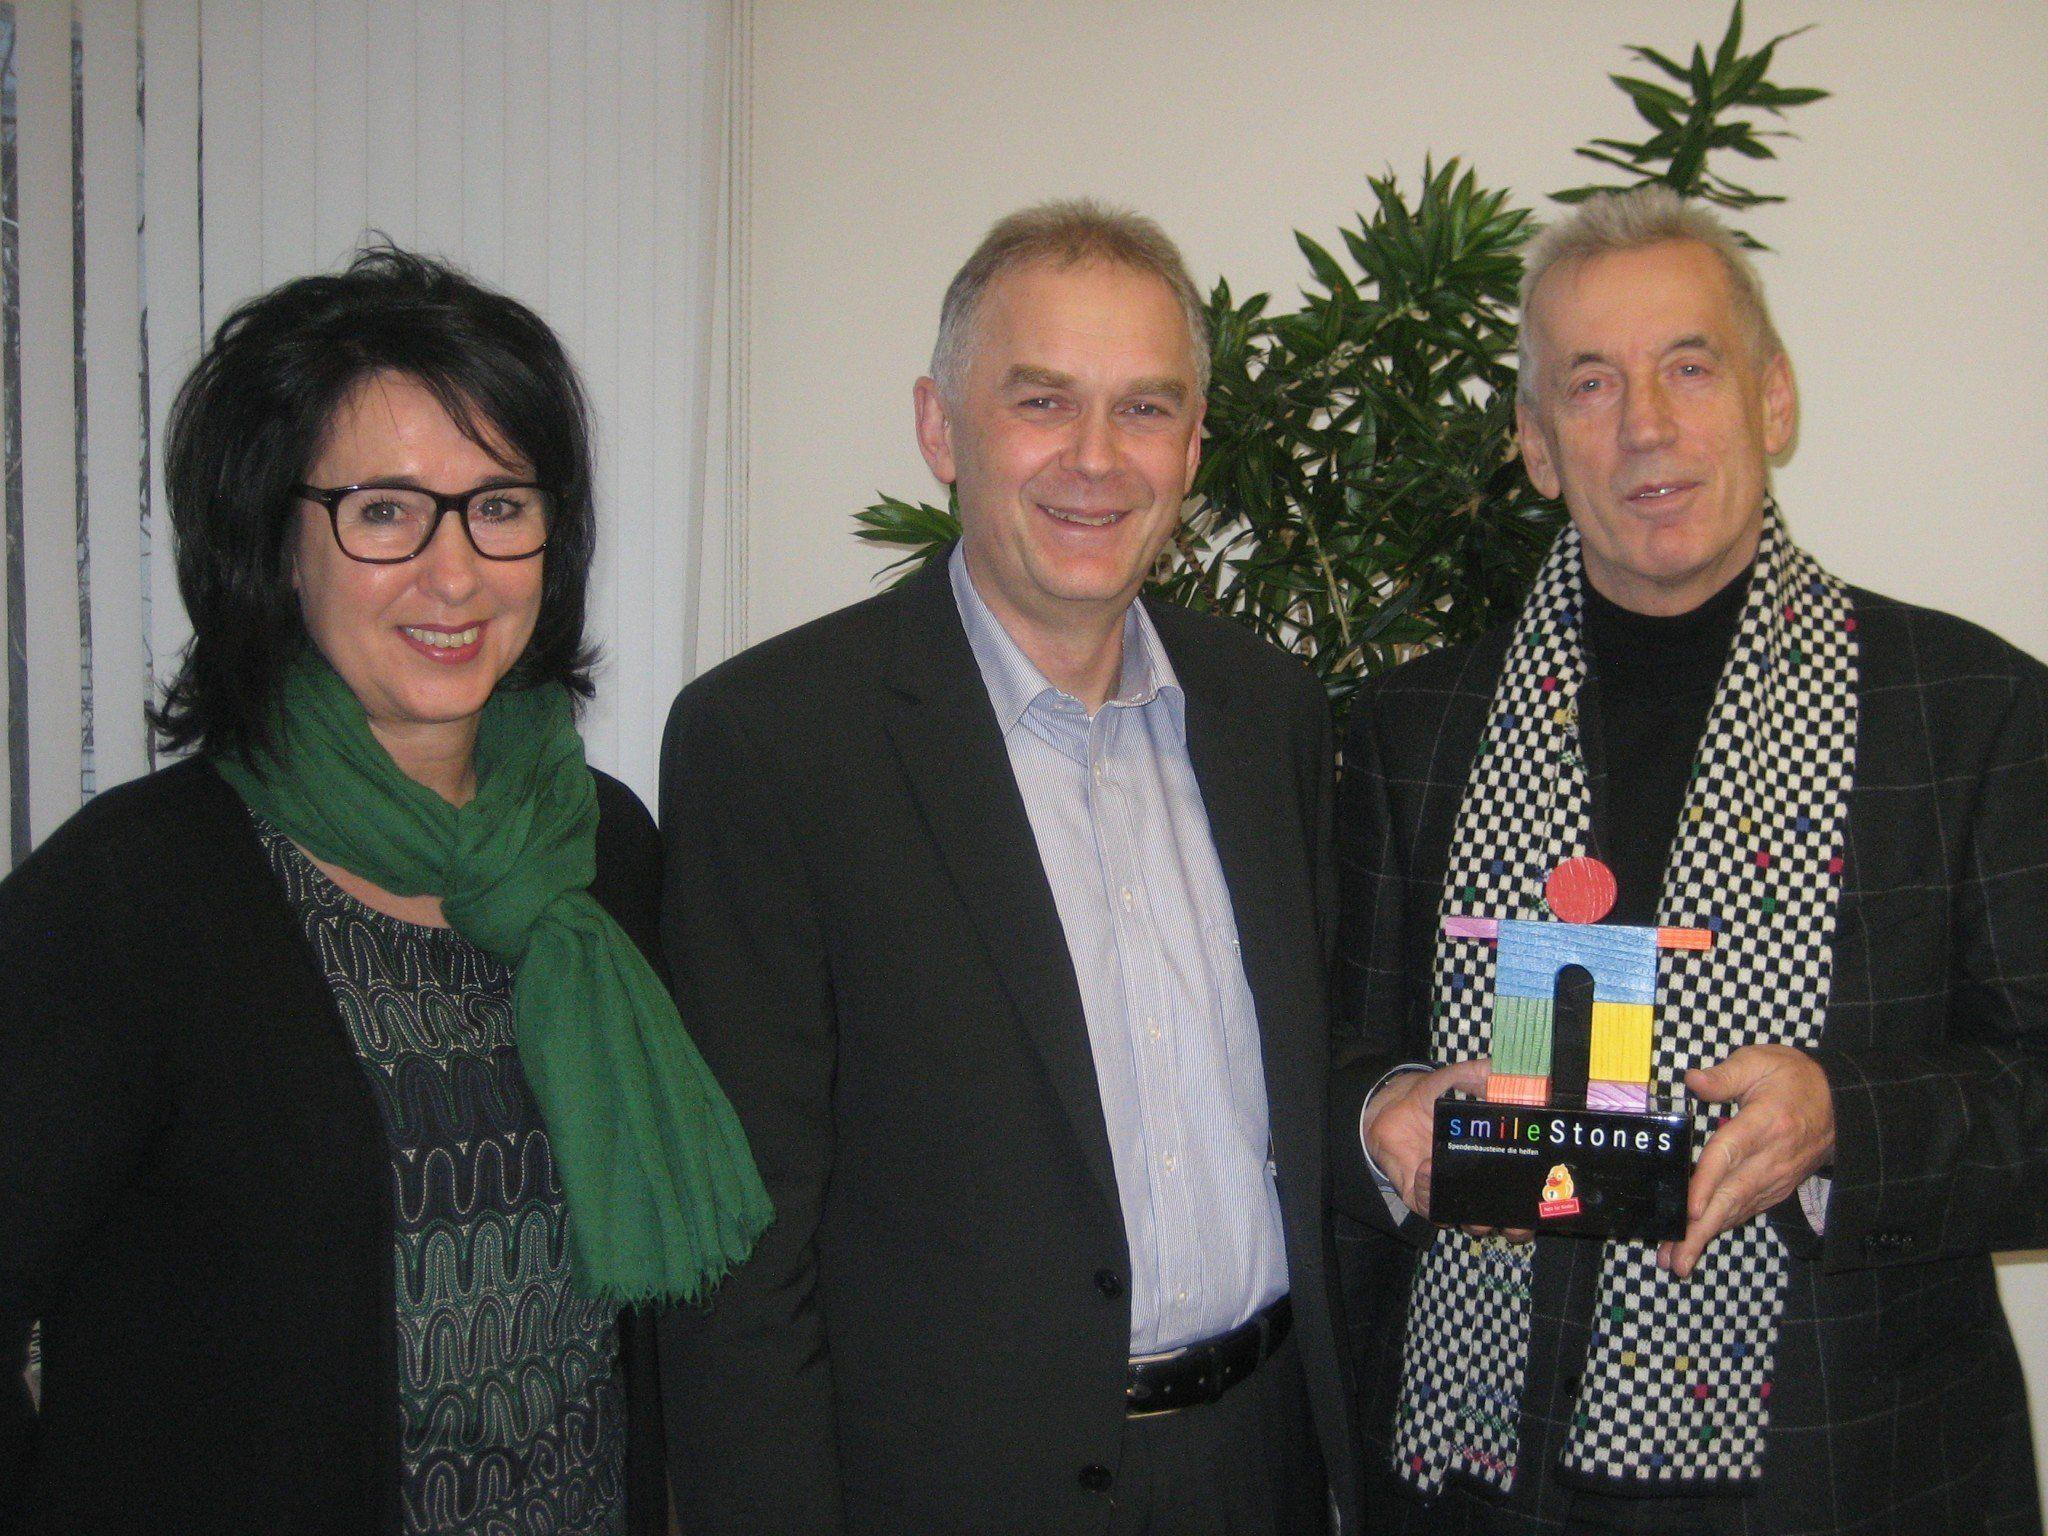 vlnr: Angelika Fertschnig, Josef Lins, Hubert Löffler